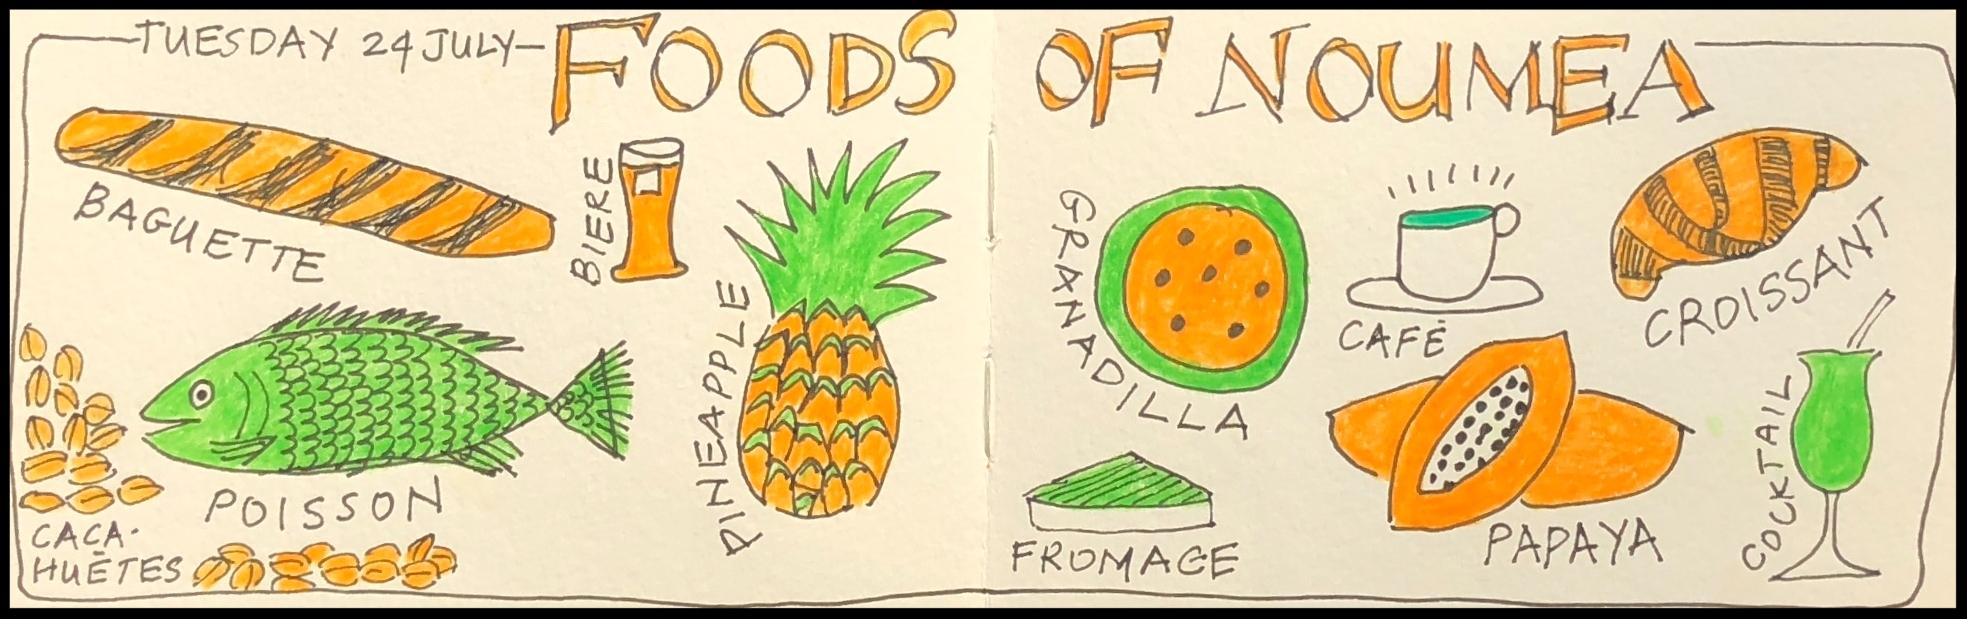 Foods of Noumea